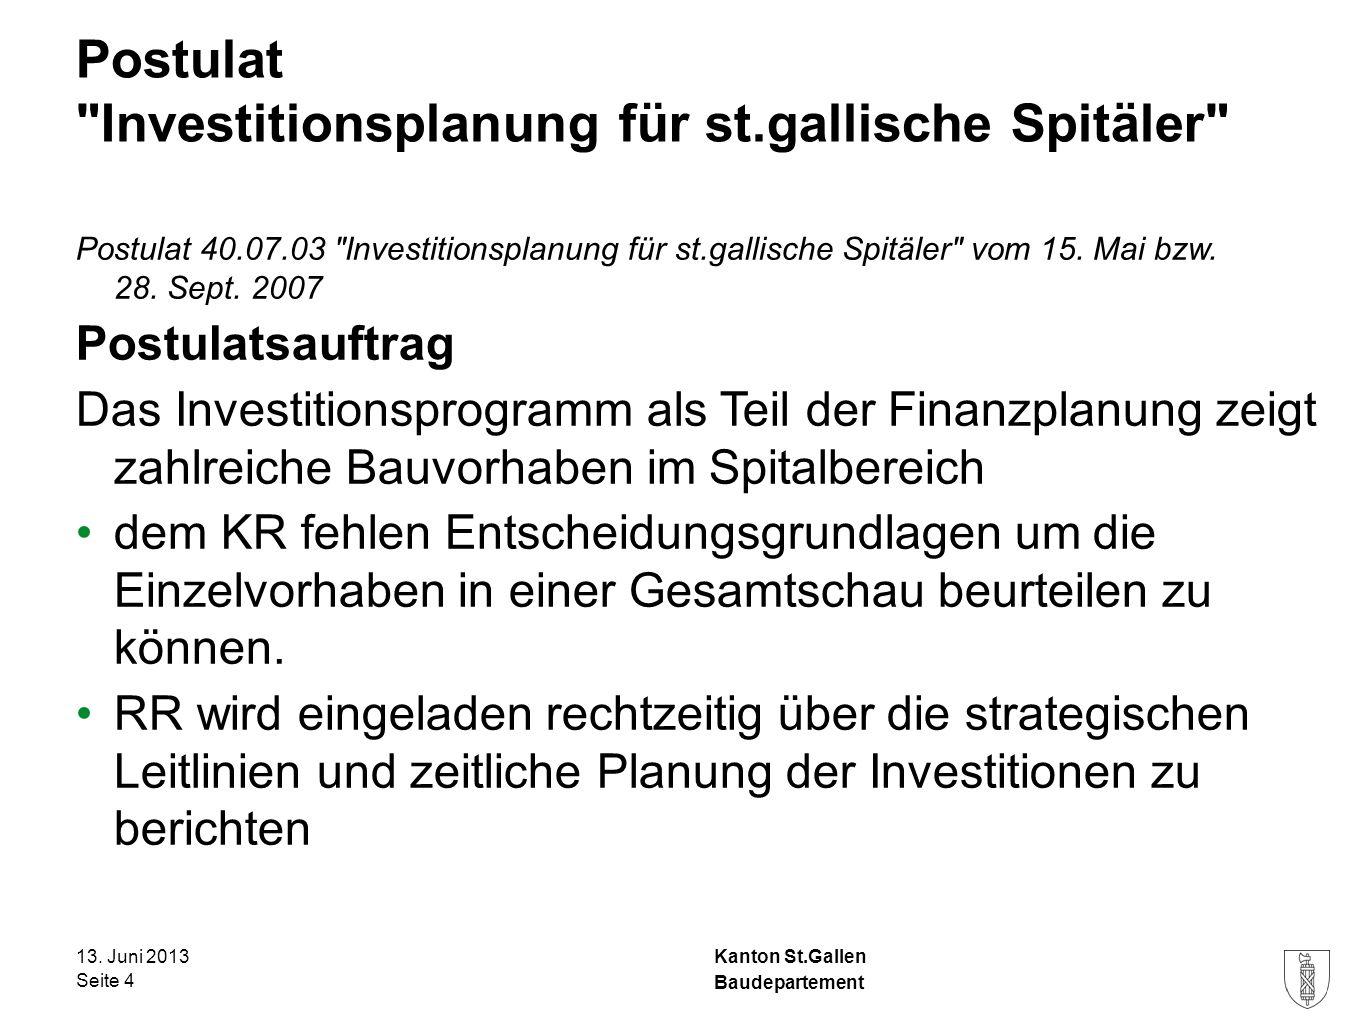 Kanton St.Gallen Postulat Investitionsplanung für st.gallische Spitäler Postulat 40.07.03 Investitionsplanung für st.gallische Spitäler vom 15.